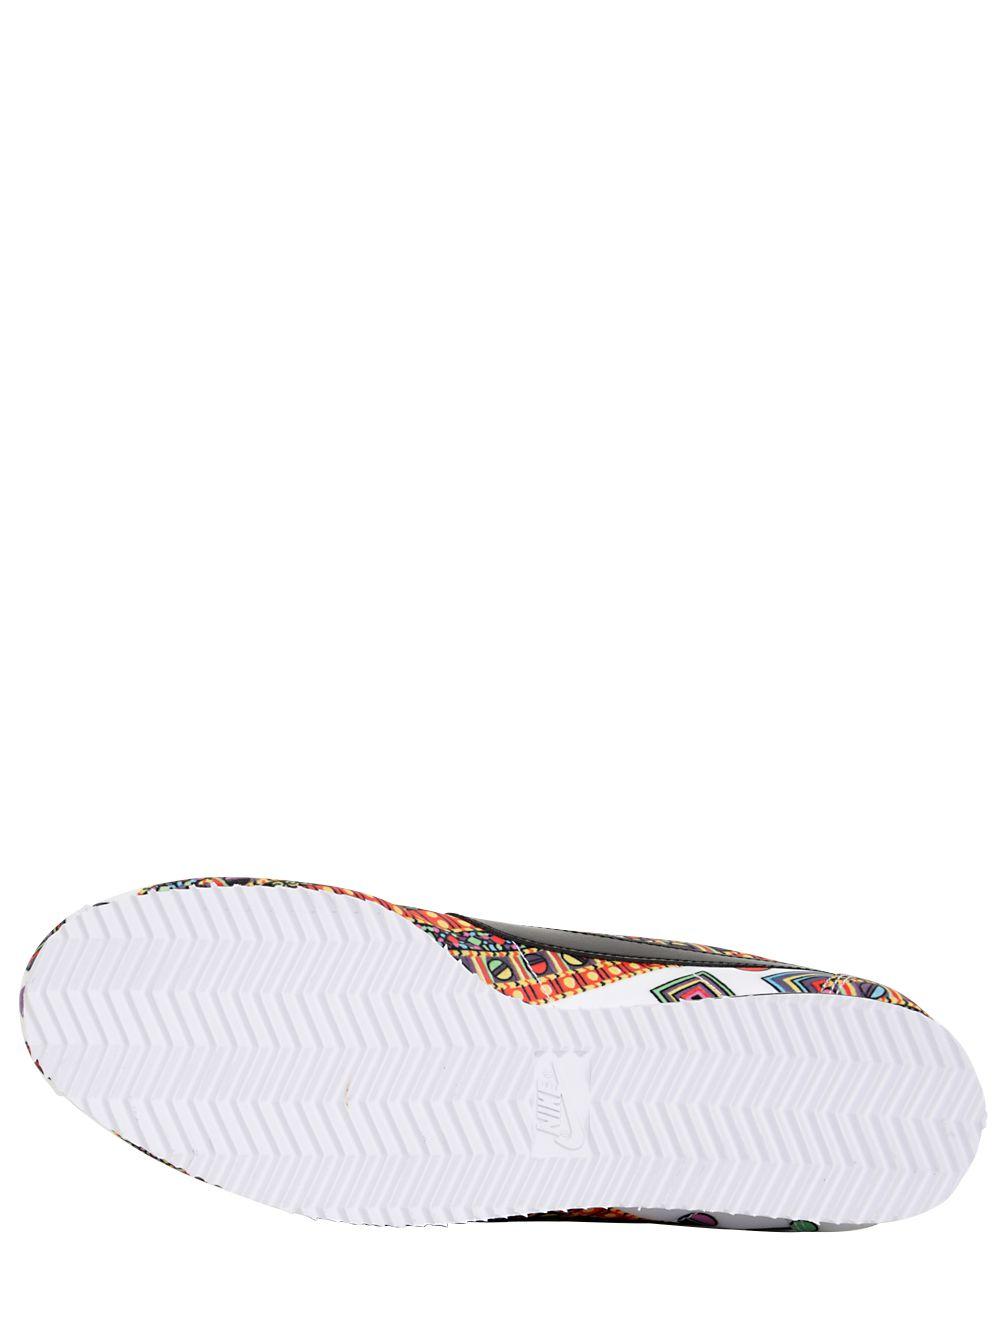 Nike Silk Liberty Classic Cortez Sneakers in White/Black/Red (White)